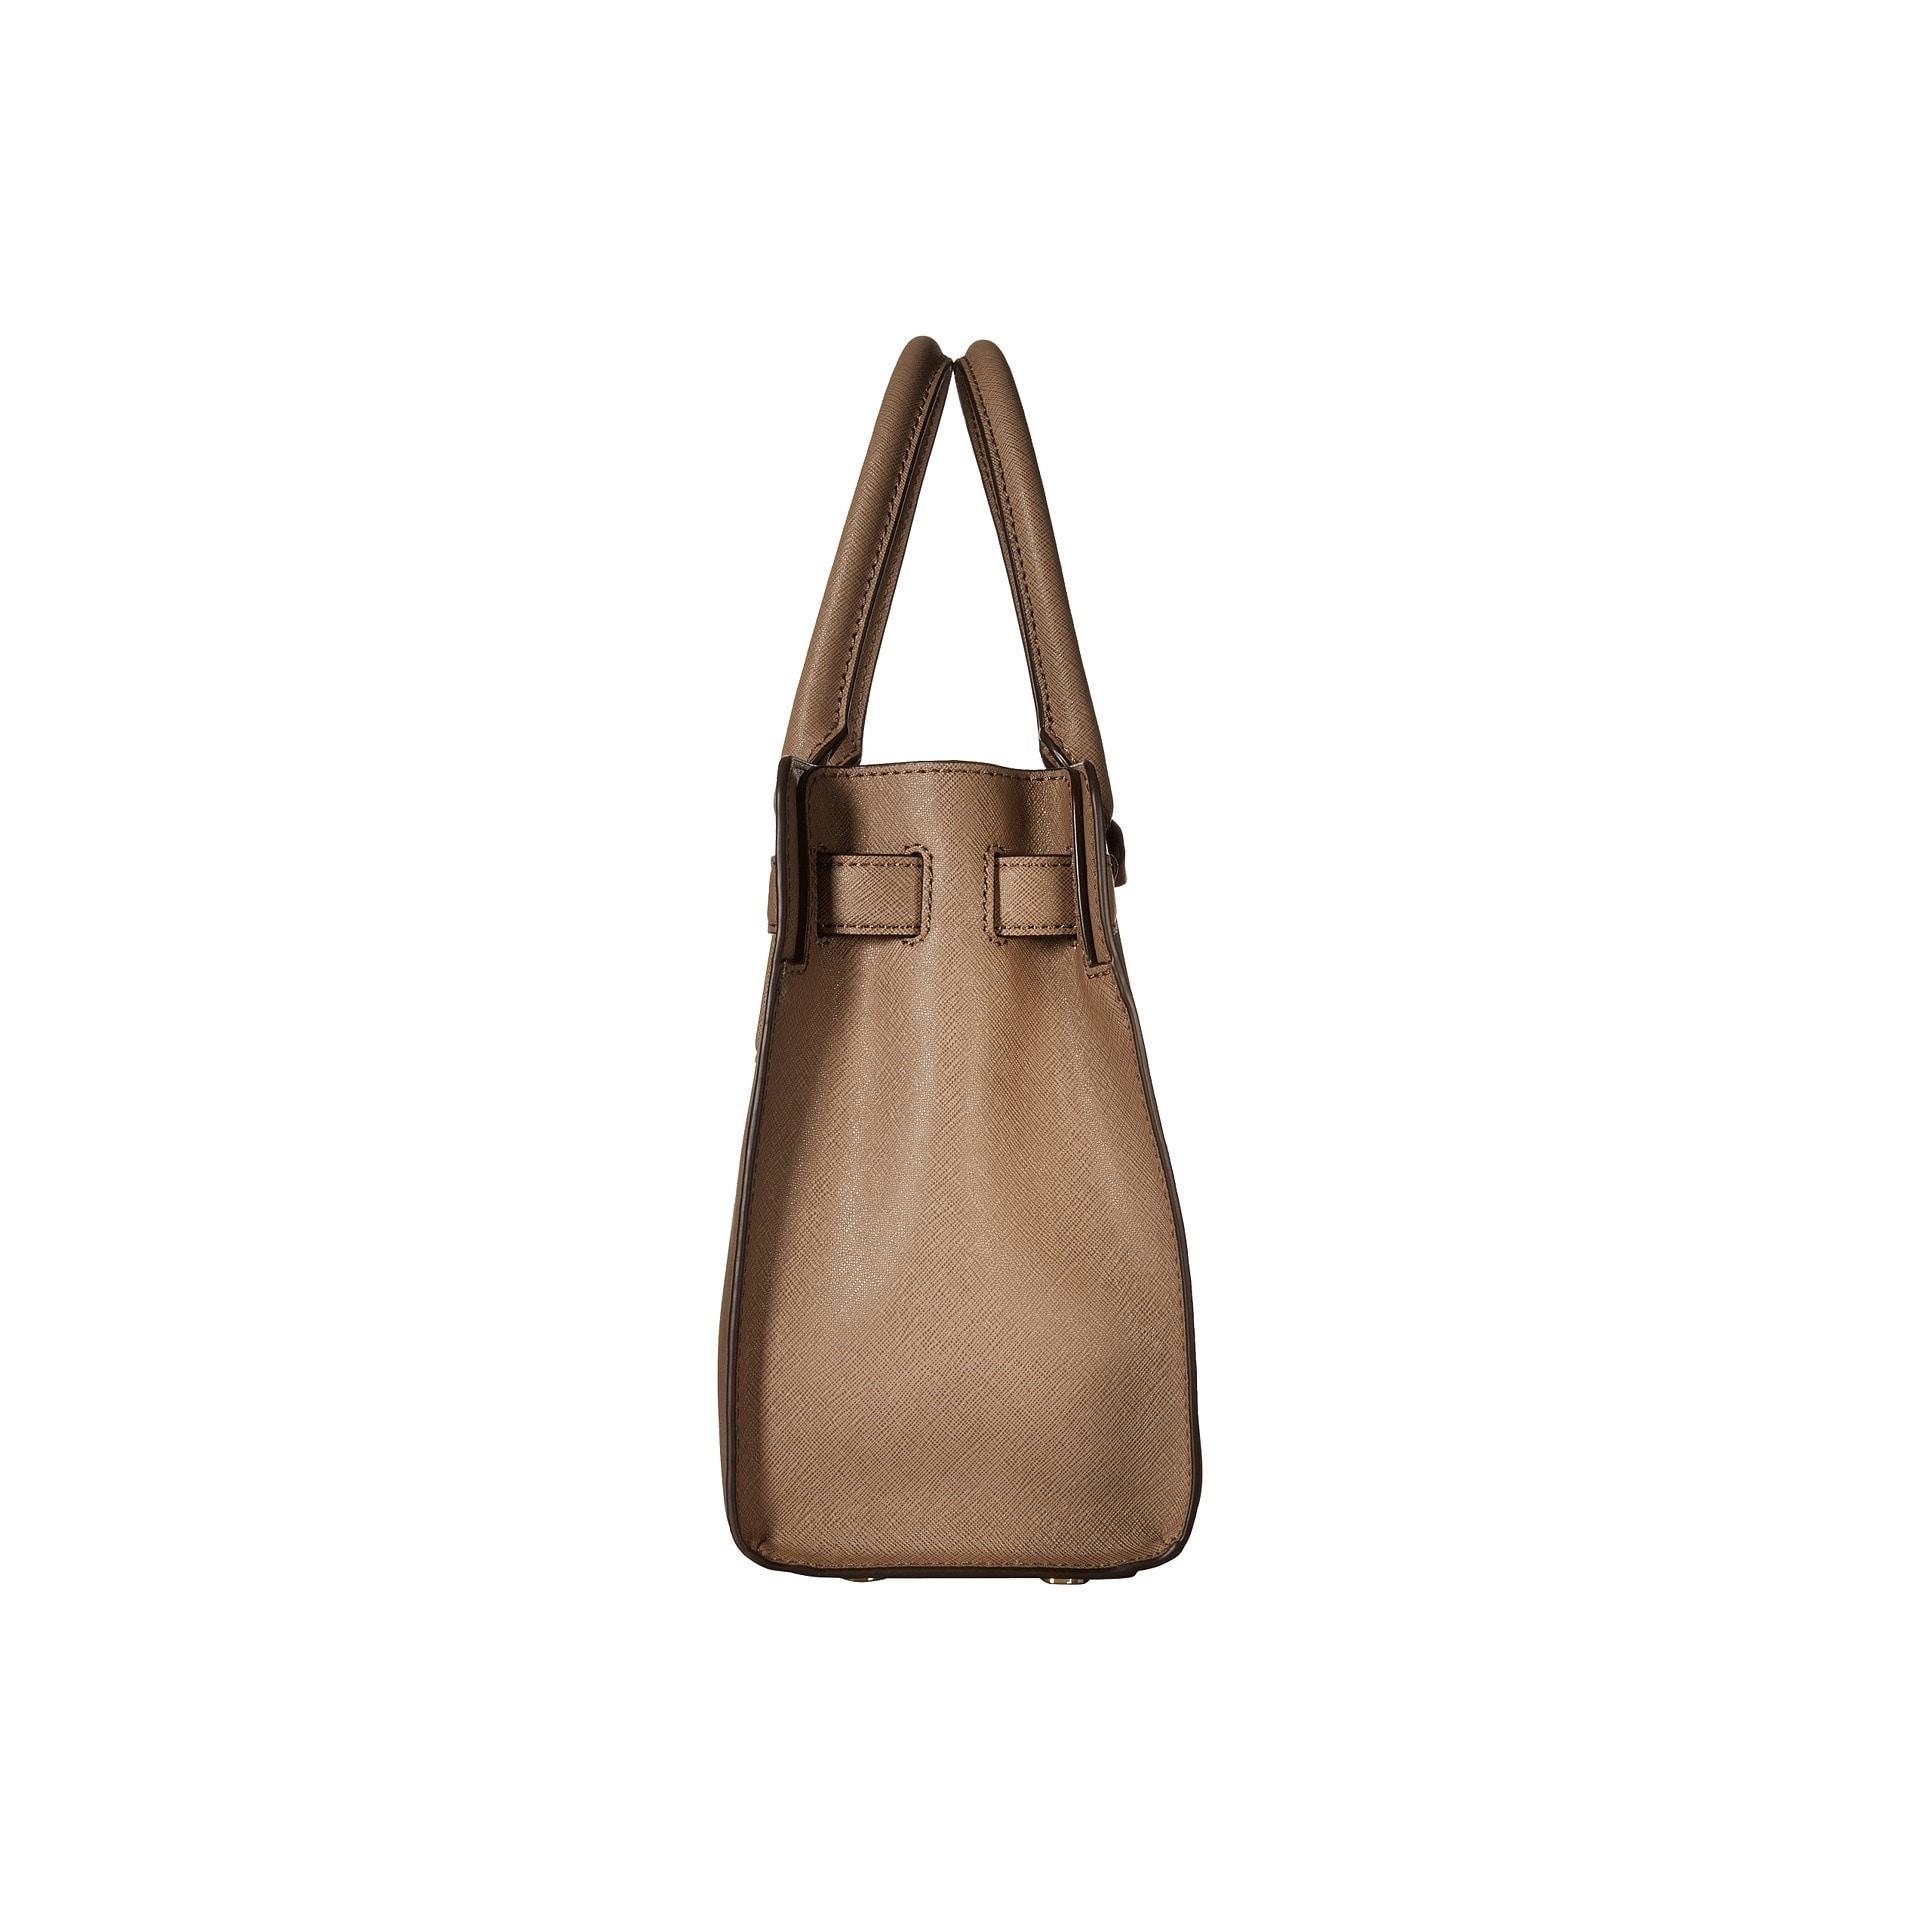 171114444c Shop Michael Kors Dillon Dark Dune East West Satchel Handbag - Free  Shipping Today - Overstock - 10702482